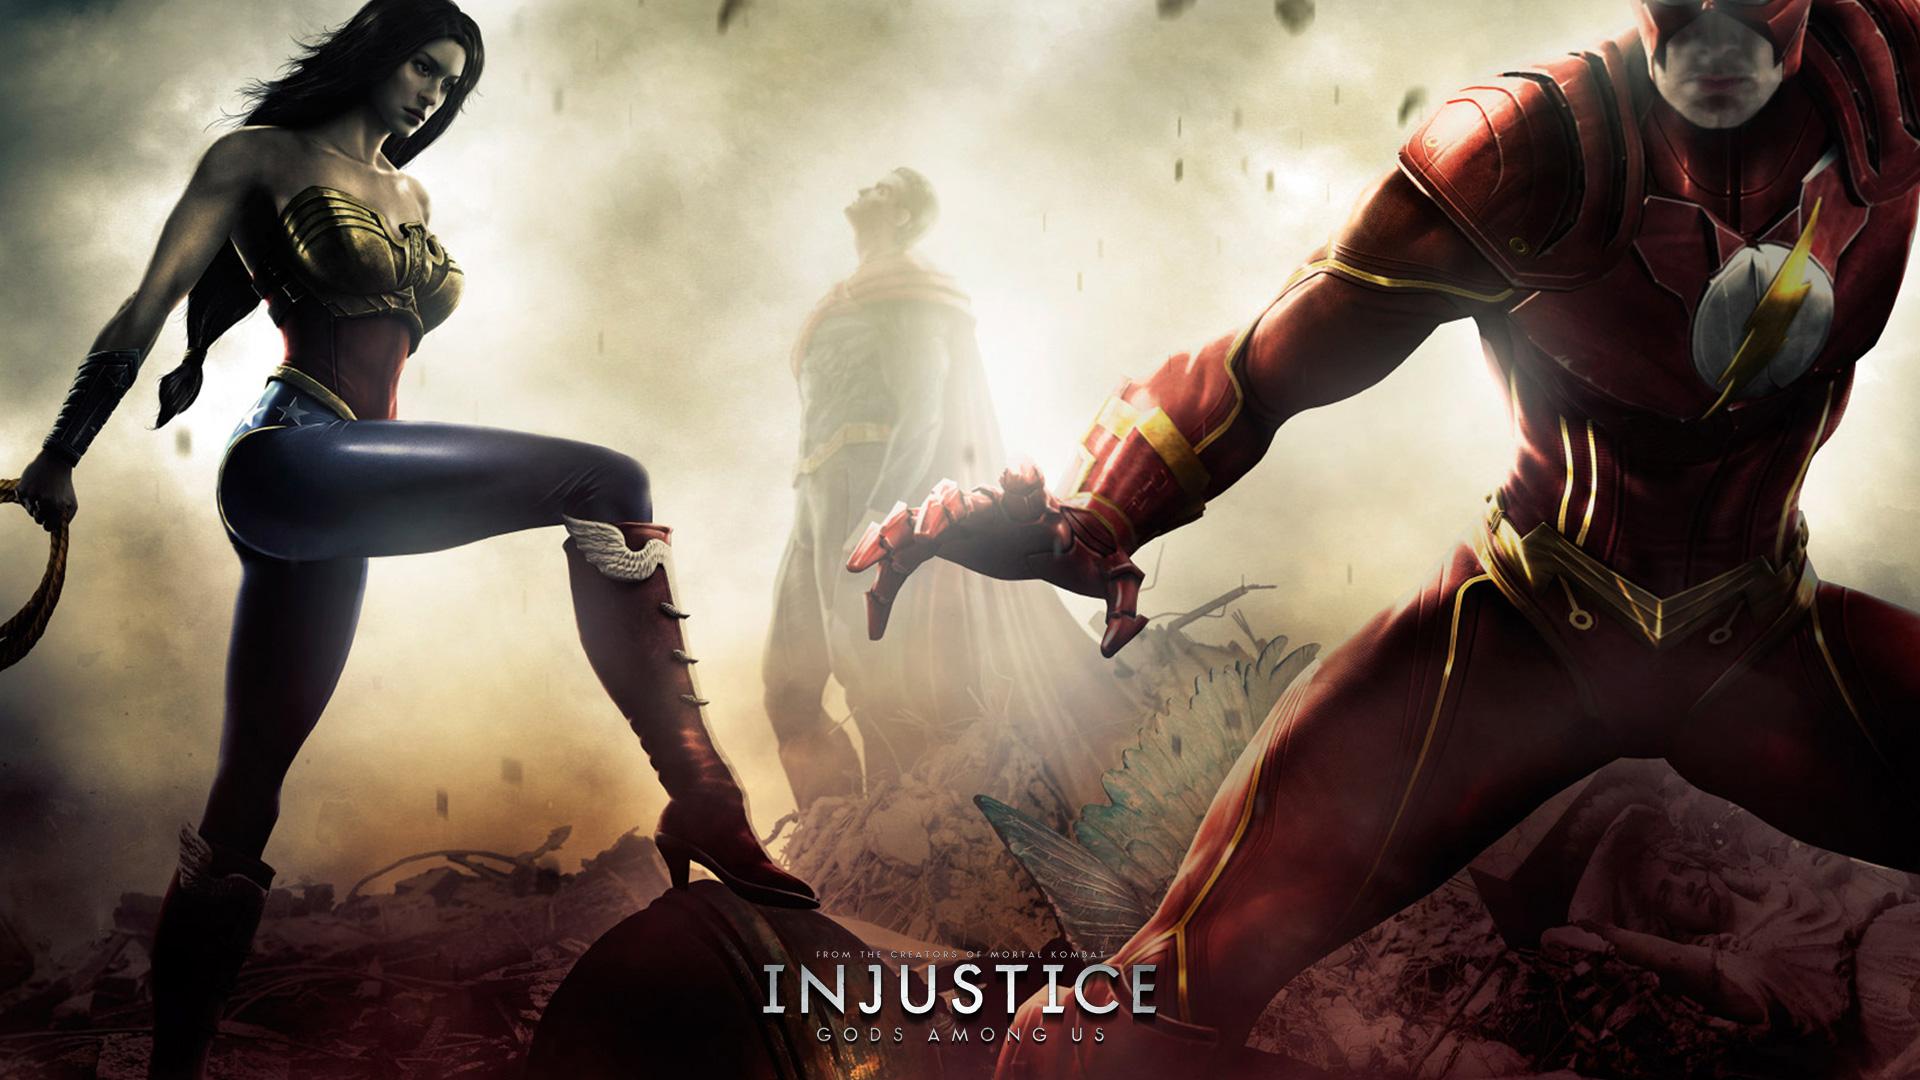 Injustice Gods Among Us Wallpaper 17